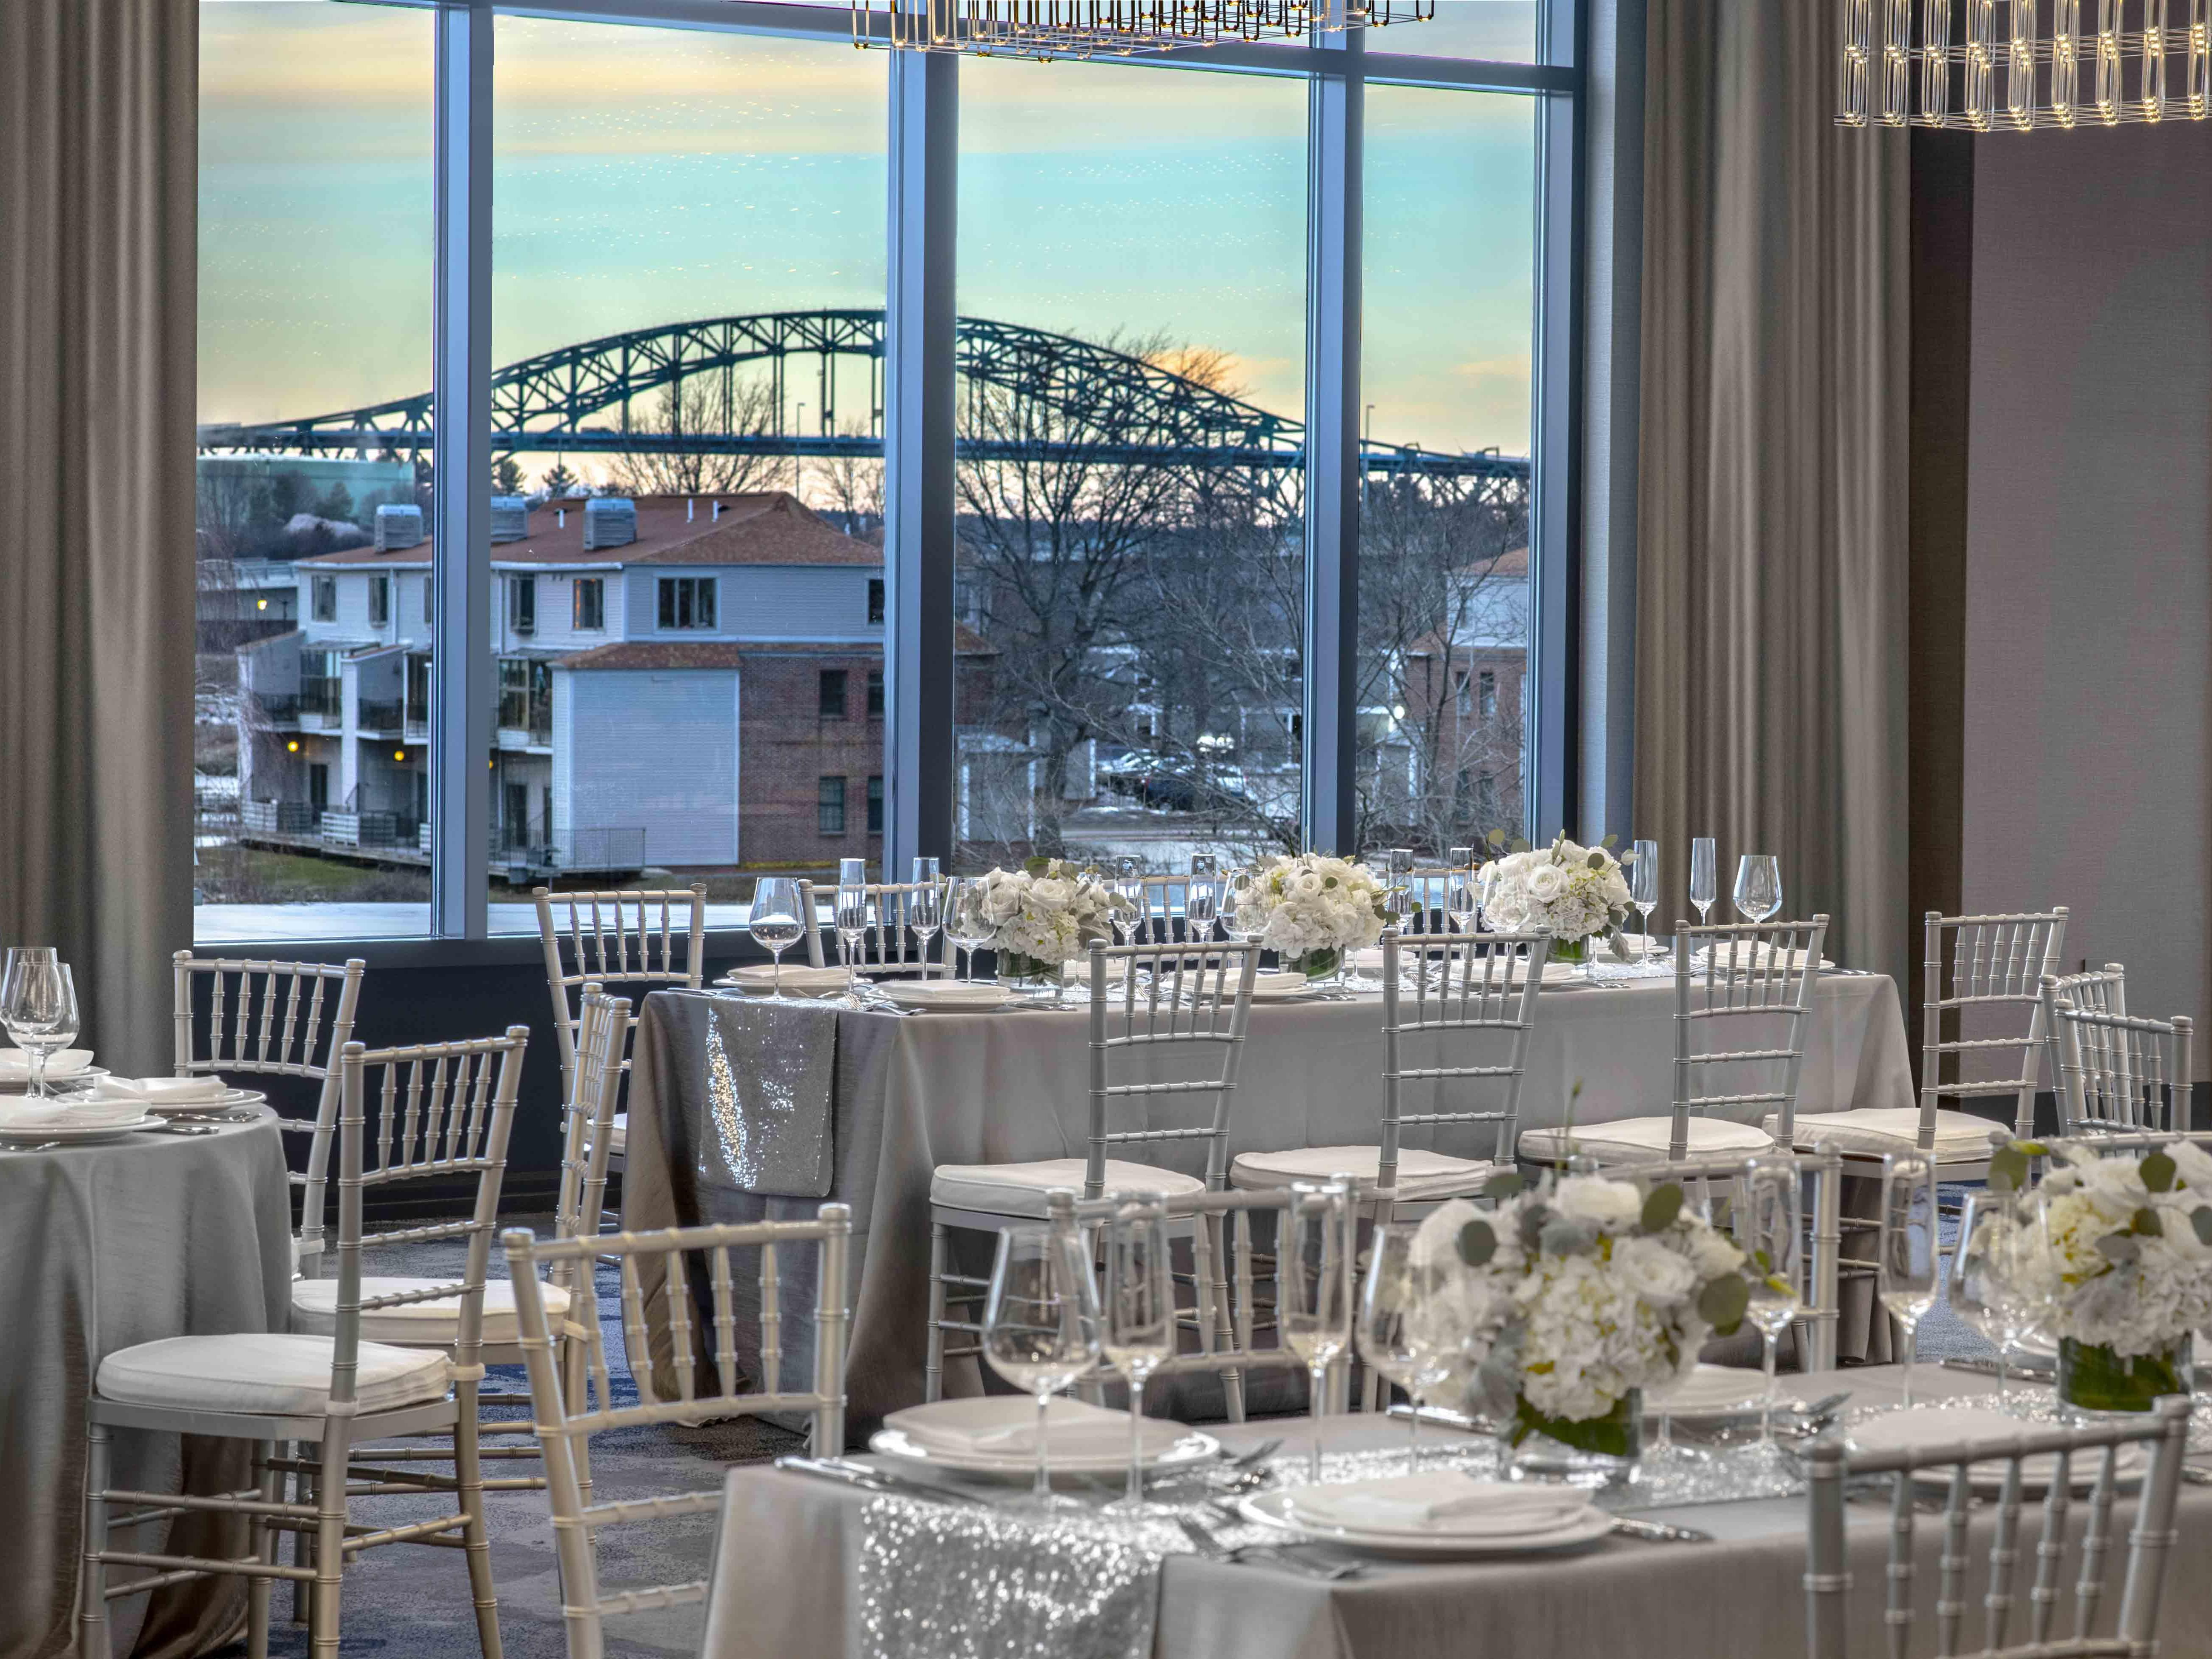 wedding venue with view of bridge